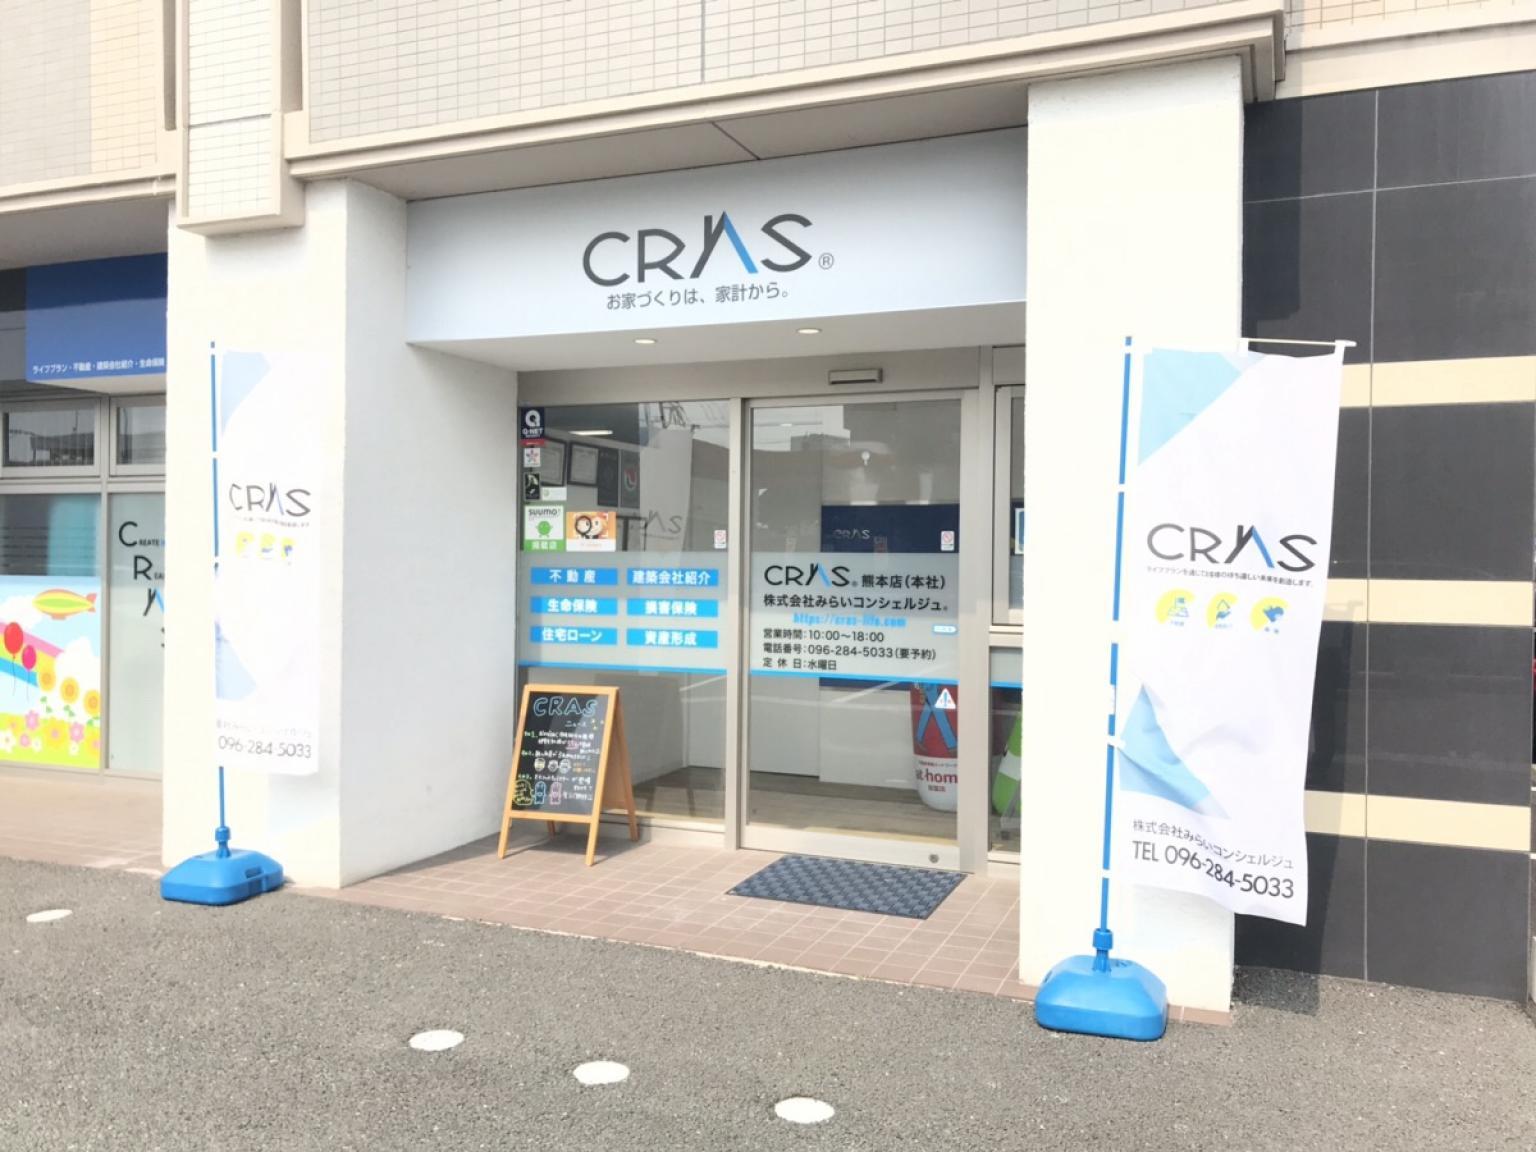 CRAS 熊本店 株式会社みらいコンシェルジュ